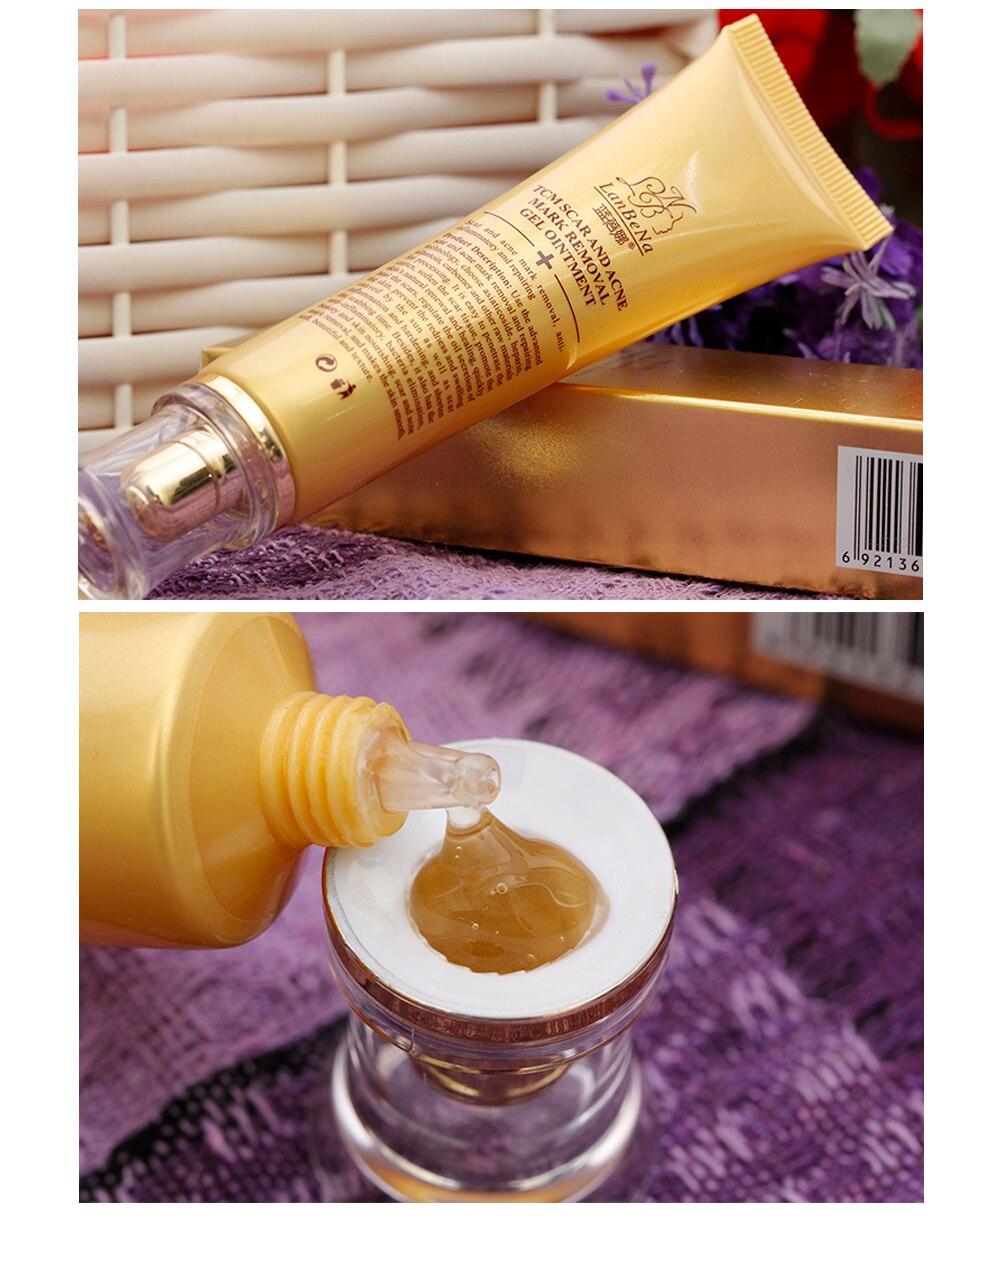 LANBENA Acne Scar Removal Cream Skin Repair Face Cream Acne Spots Acne Treatment Blackhead Whitening Cream Stretch Marks 30ml 9